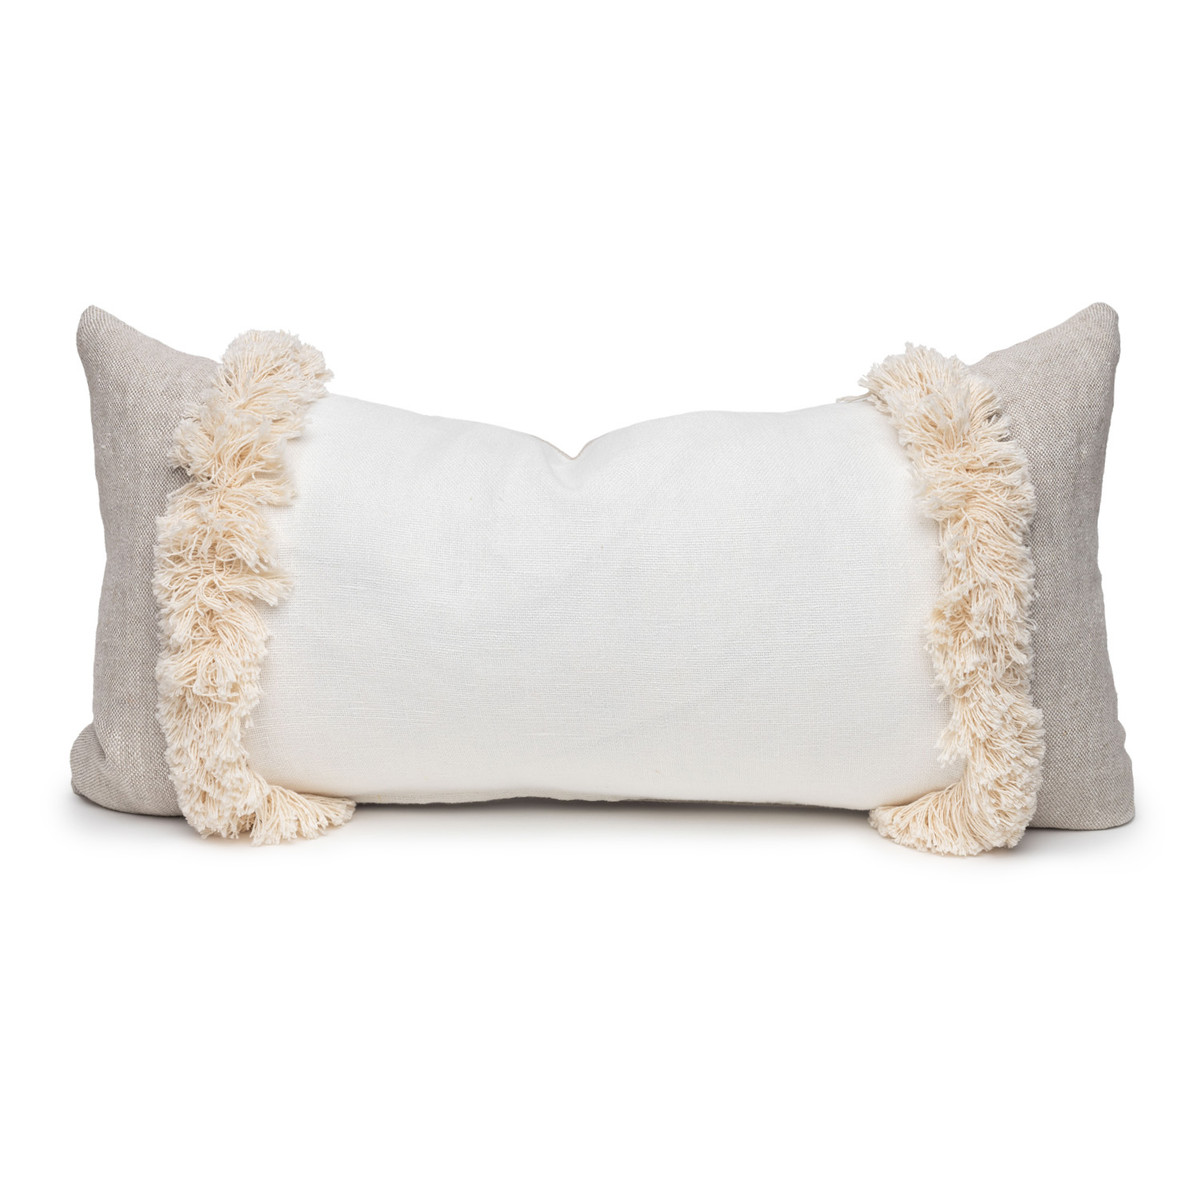 Muse Linen Lumbar Fringe Pillow Blanc-  14 x 27 - Front View